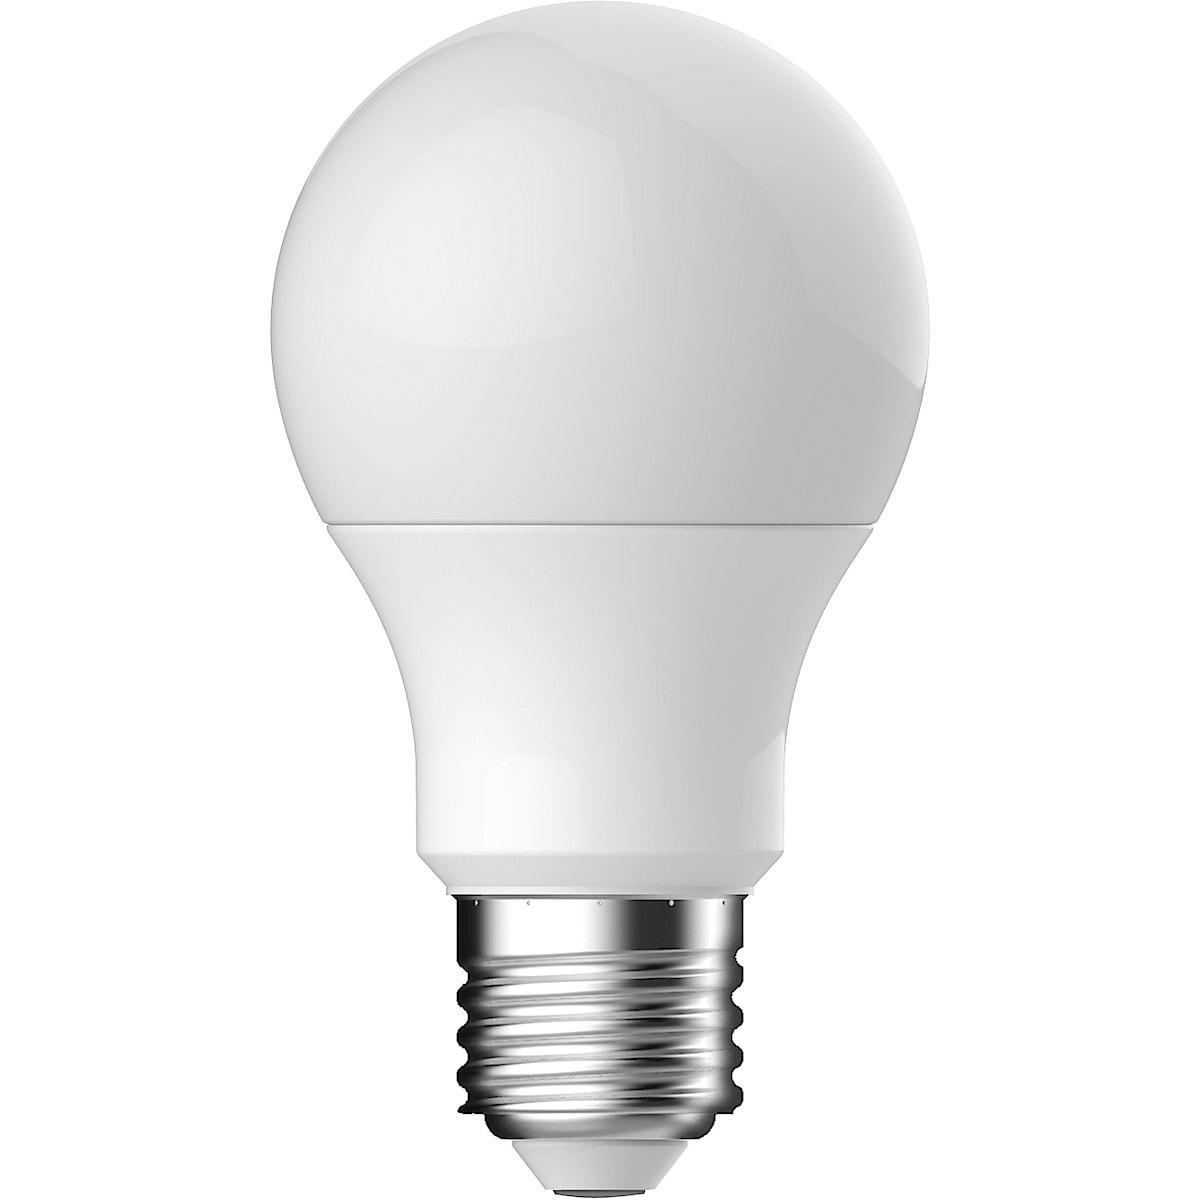 Normallampa LED E27 Clas Ohlson